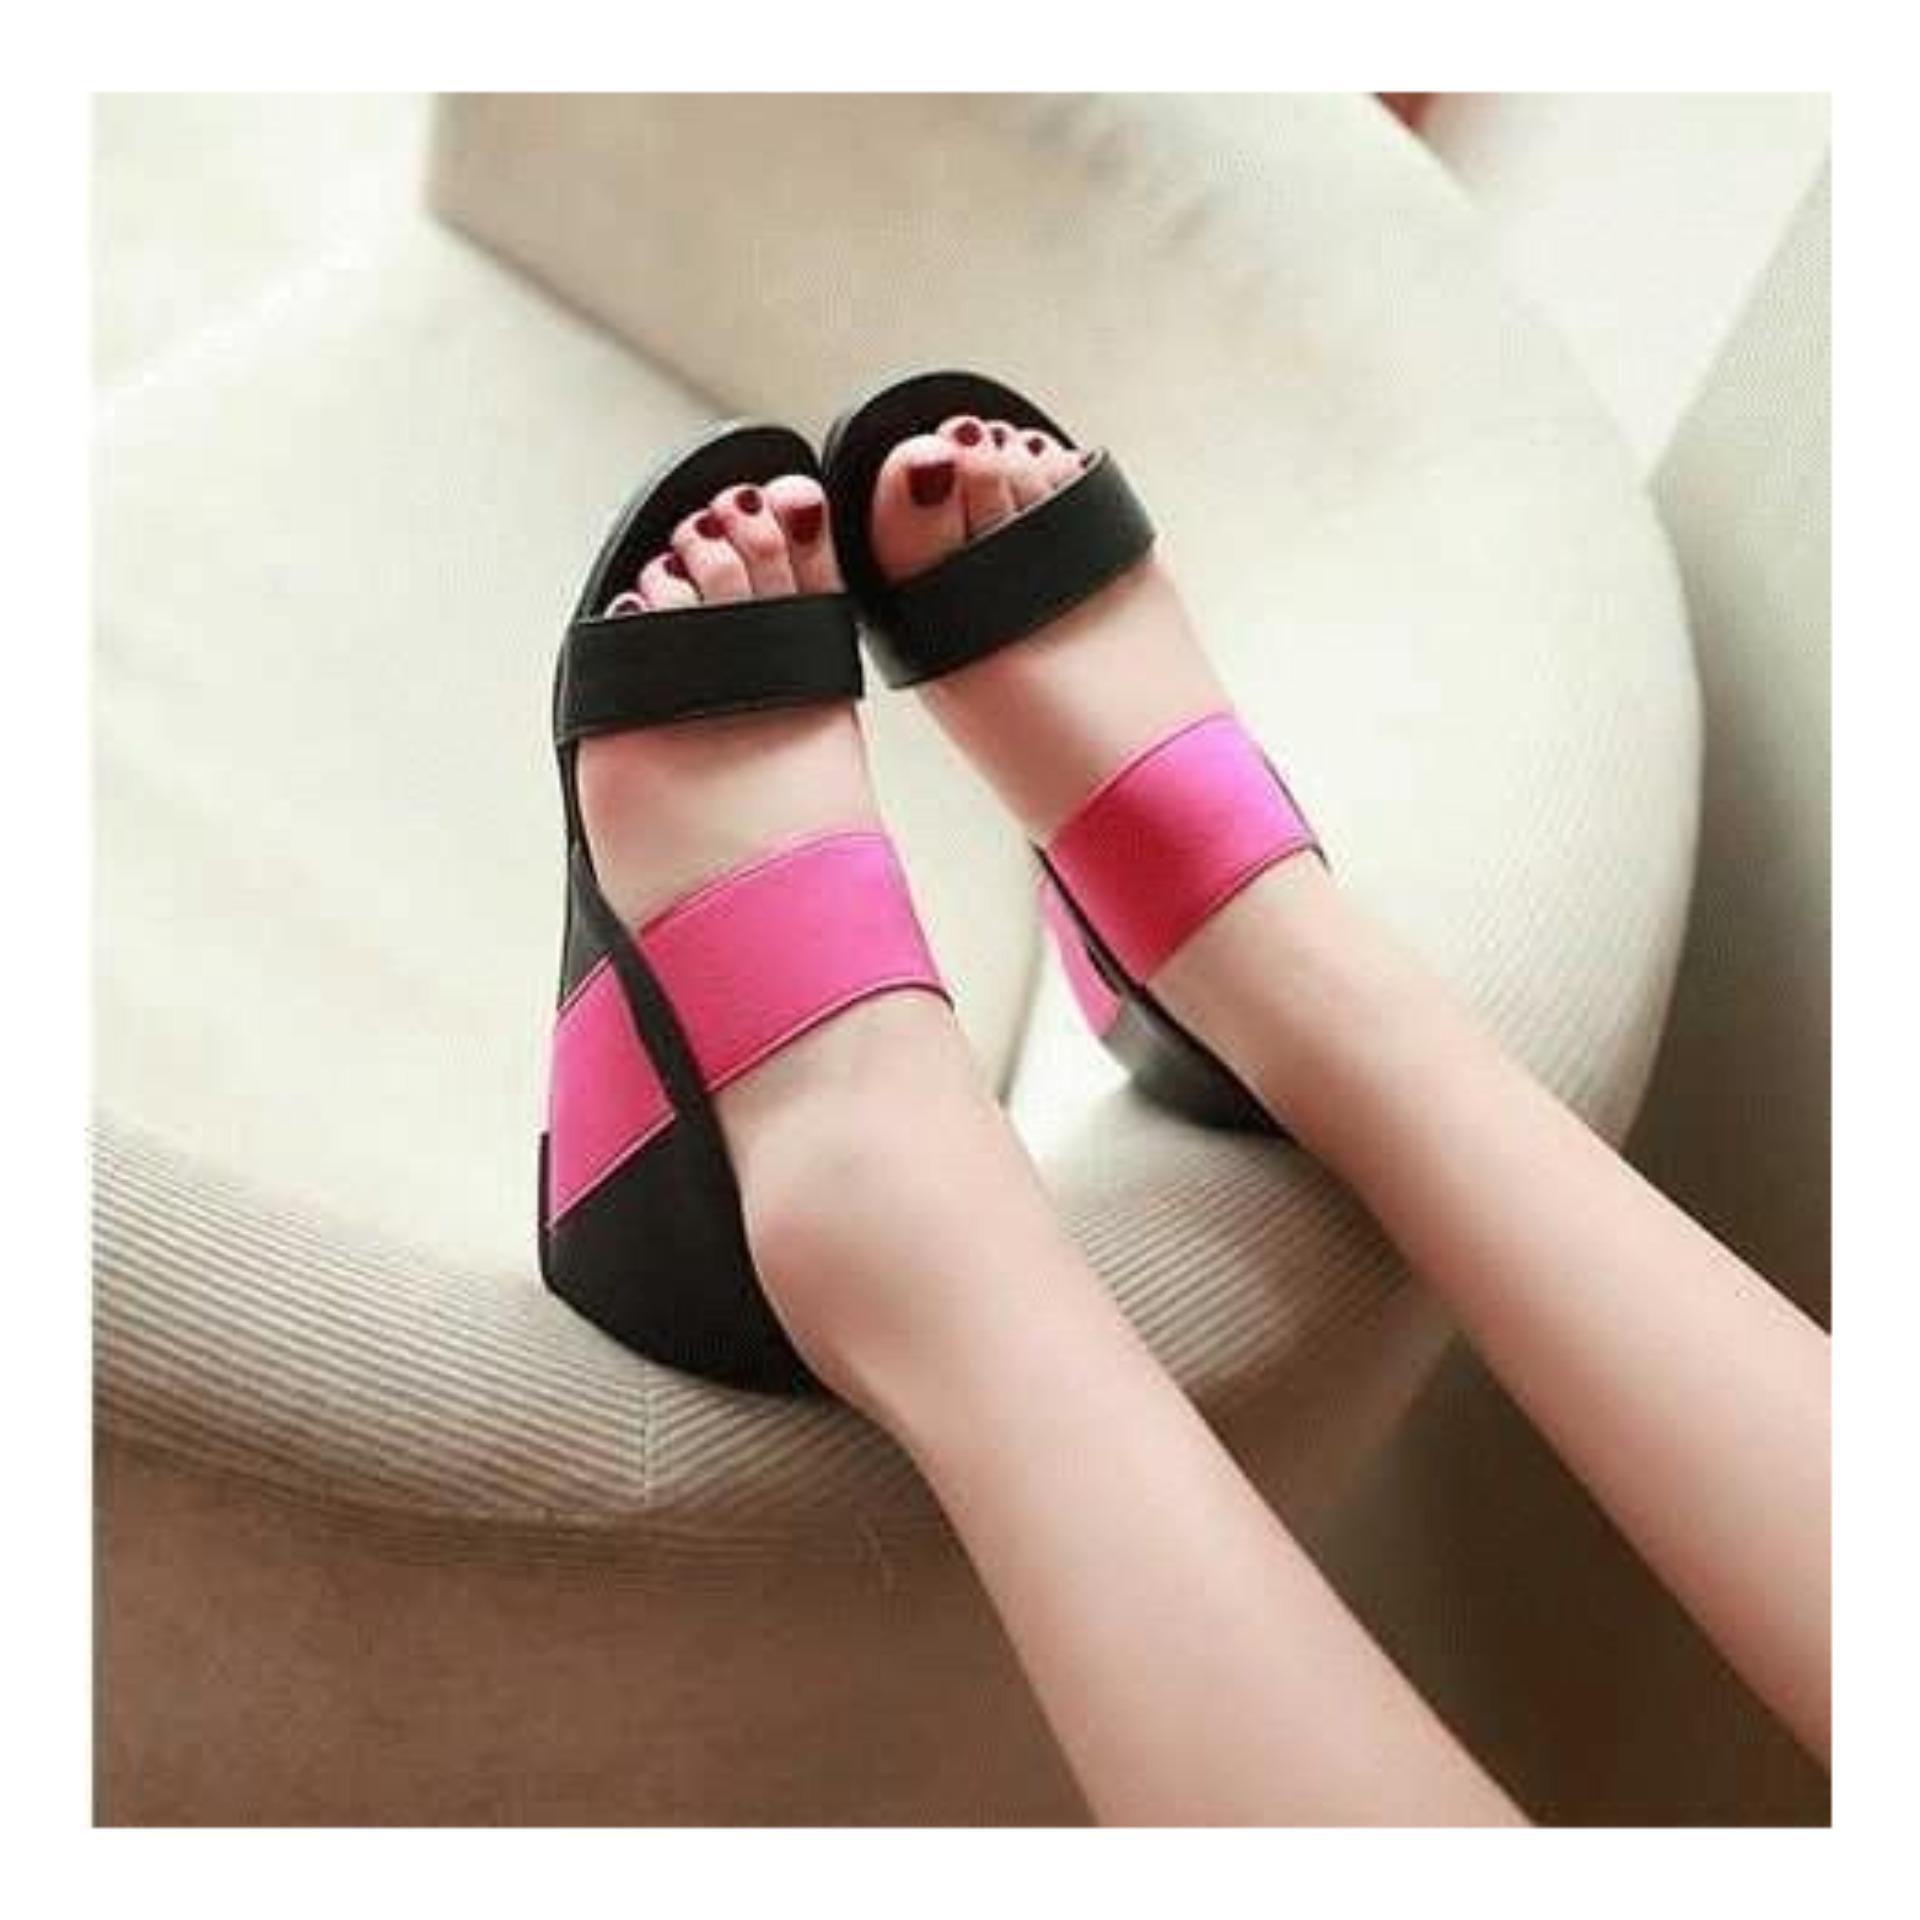 Jual Amazara Corrine Hazelnut Glossy Flatshoes Cokelat Muda 37 Black Hitam 39 Epatu Flat Shoes Slip On Wanita Cewek Bahan Kulitglossy